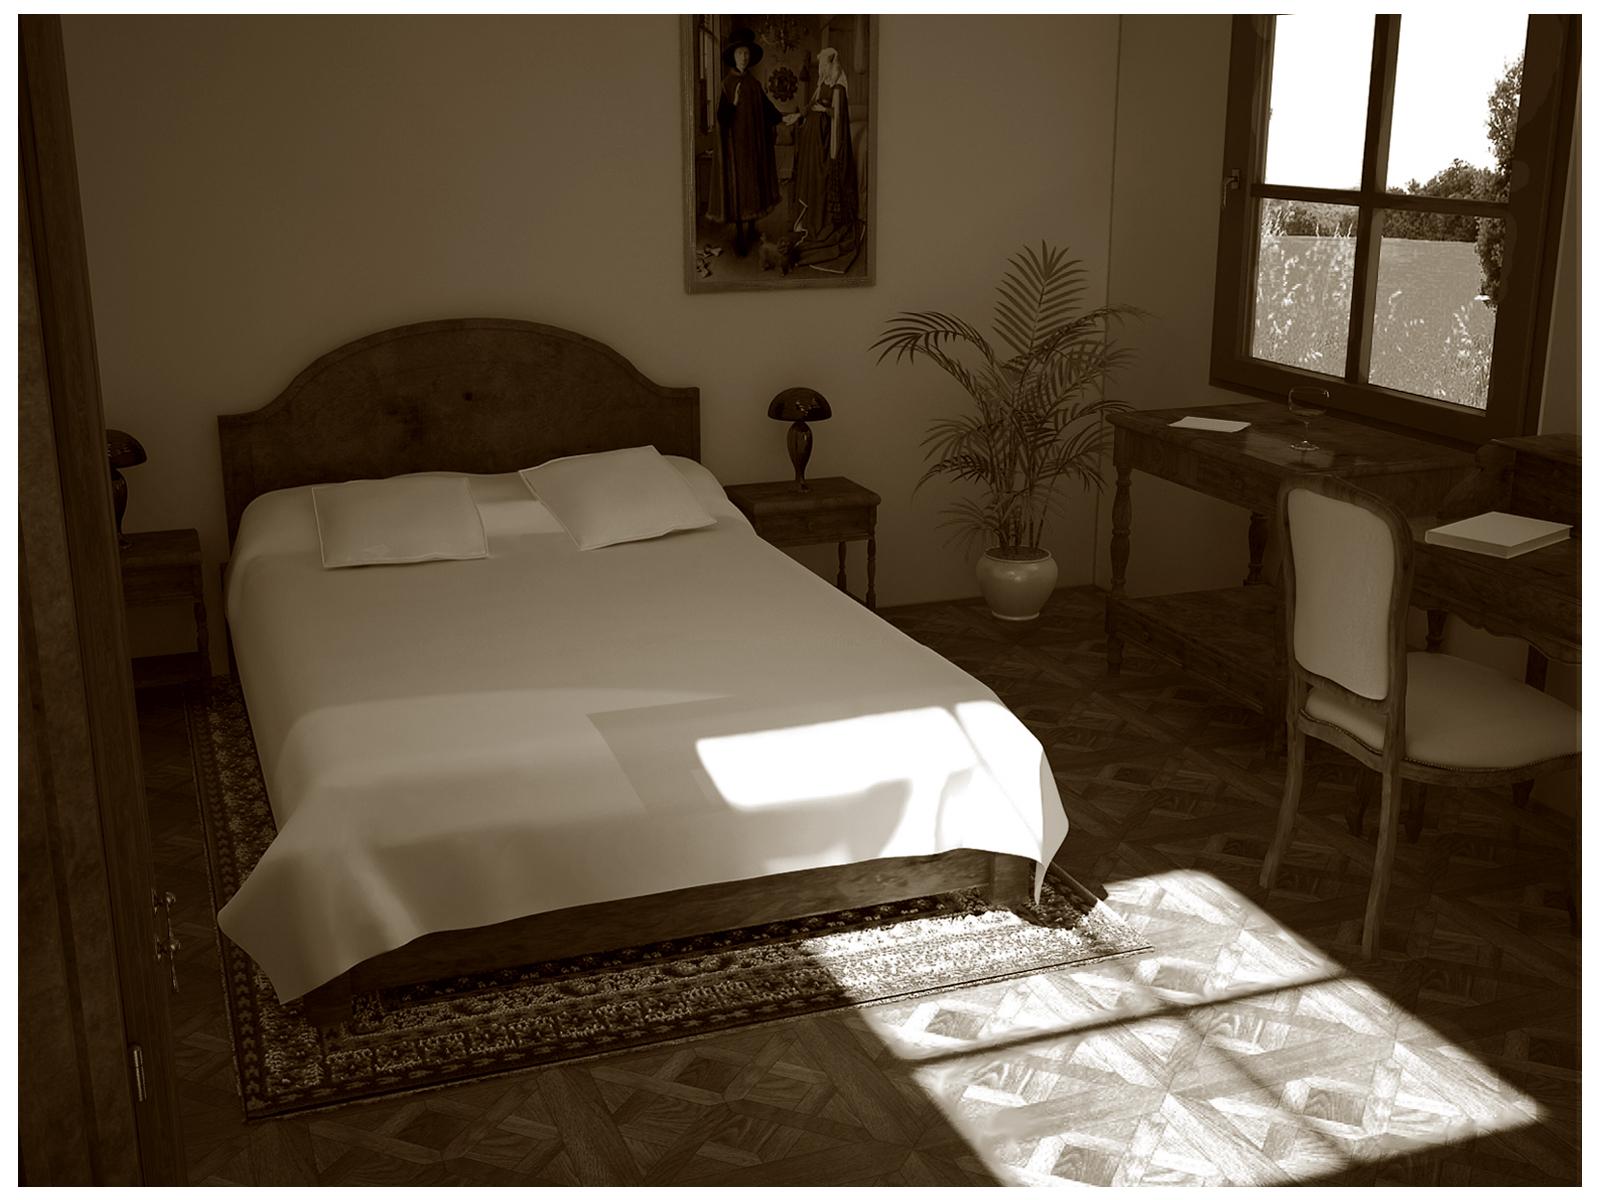 chambre ancienne by exodart on deviantart. Black Bedroom Furniture Sets. Home Design Ideas